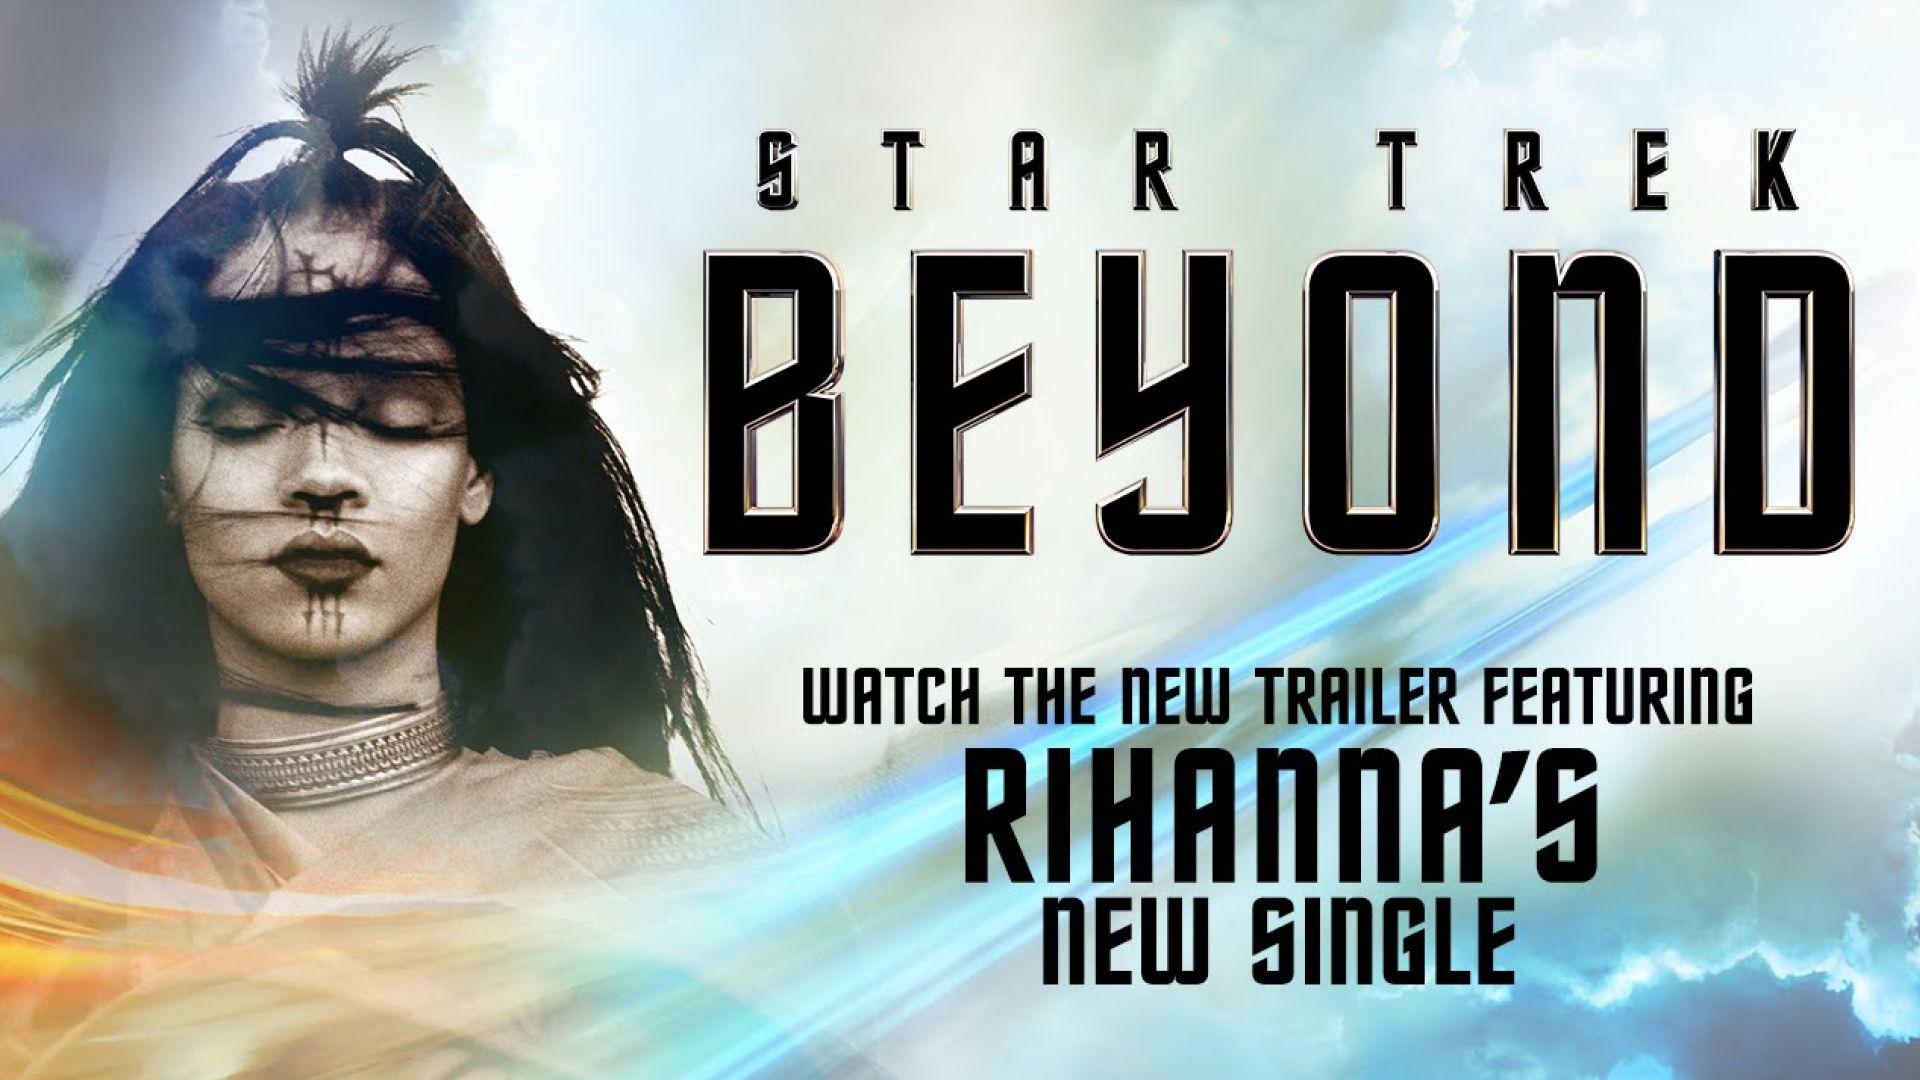 "New Star Trek Beyond Trailer Featuring ""Sledgehammer"" By Rih"